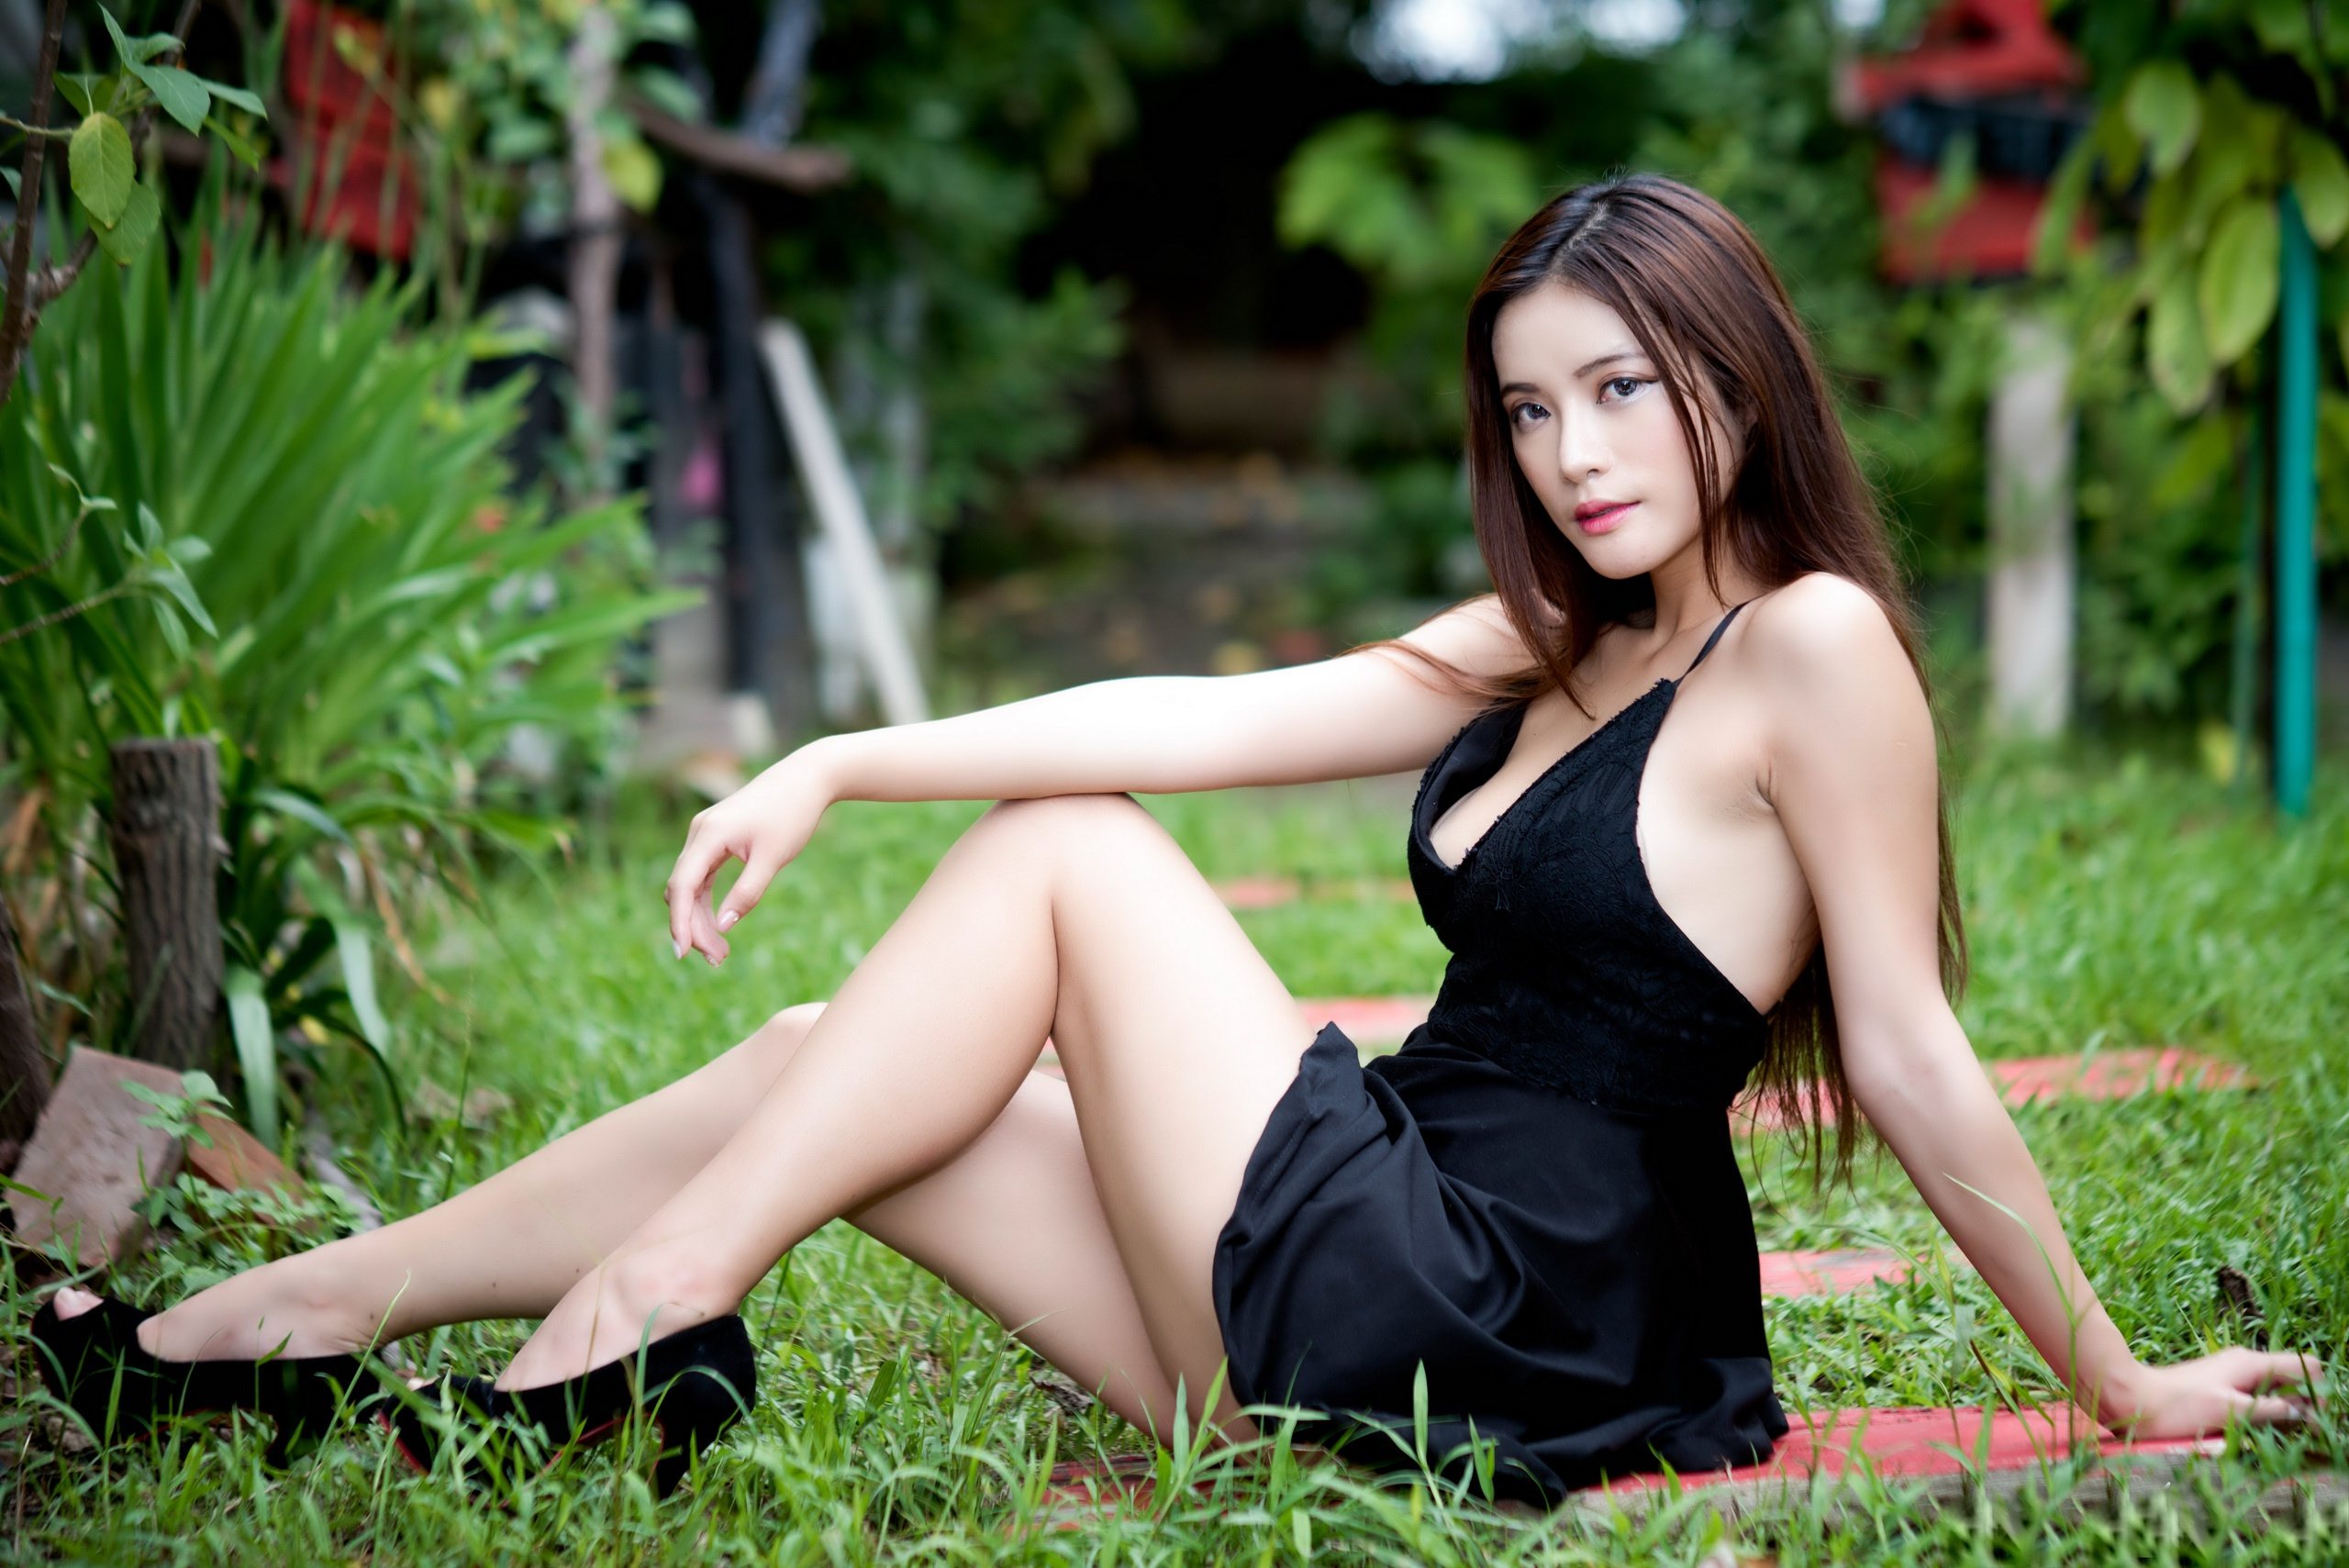 People 2560x1709 Asian women black dress high heels sitting grass women outdoors long hair legs cleavage eyeliner looking at viewer fake iris